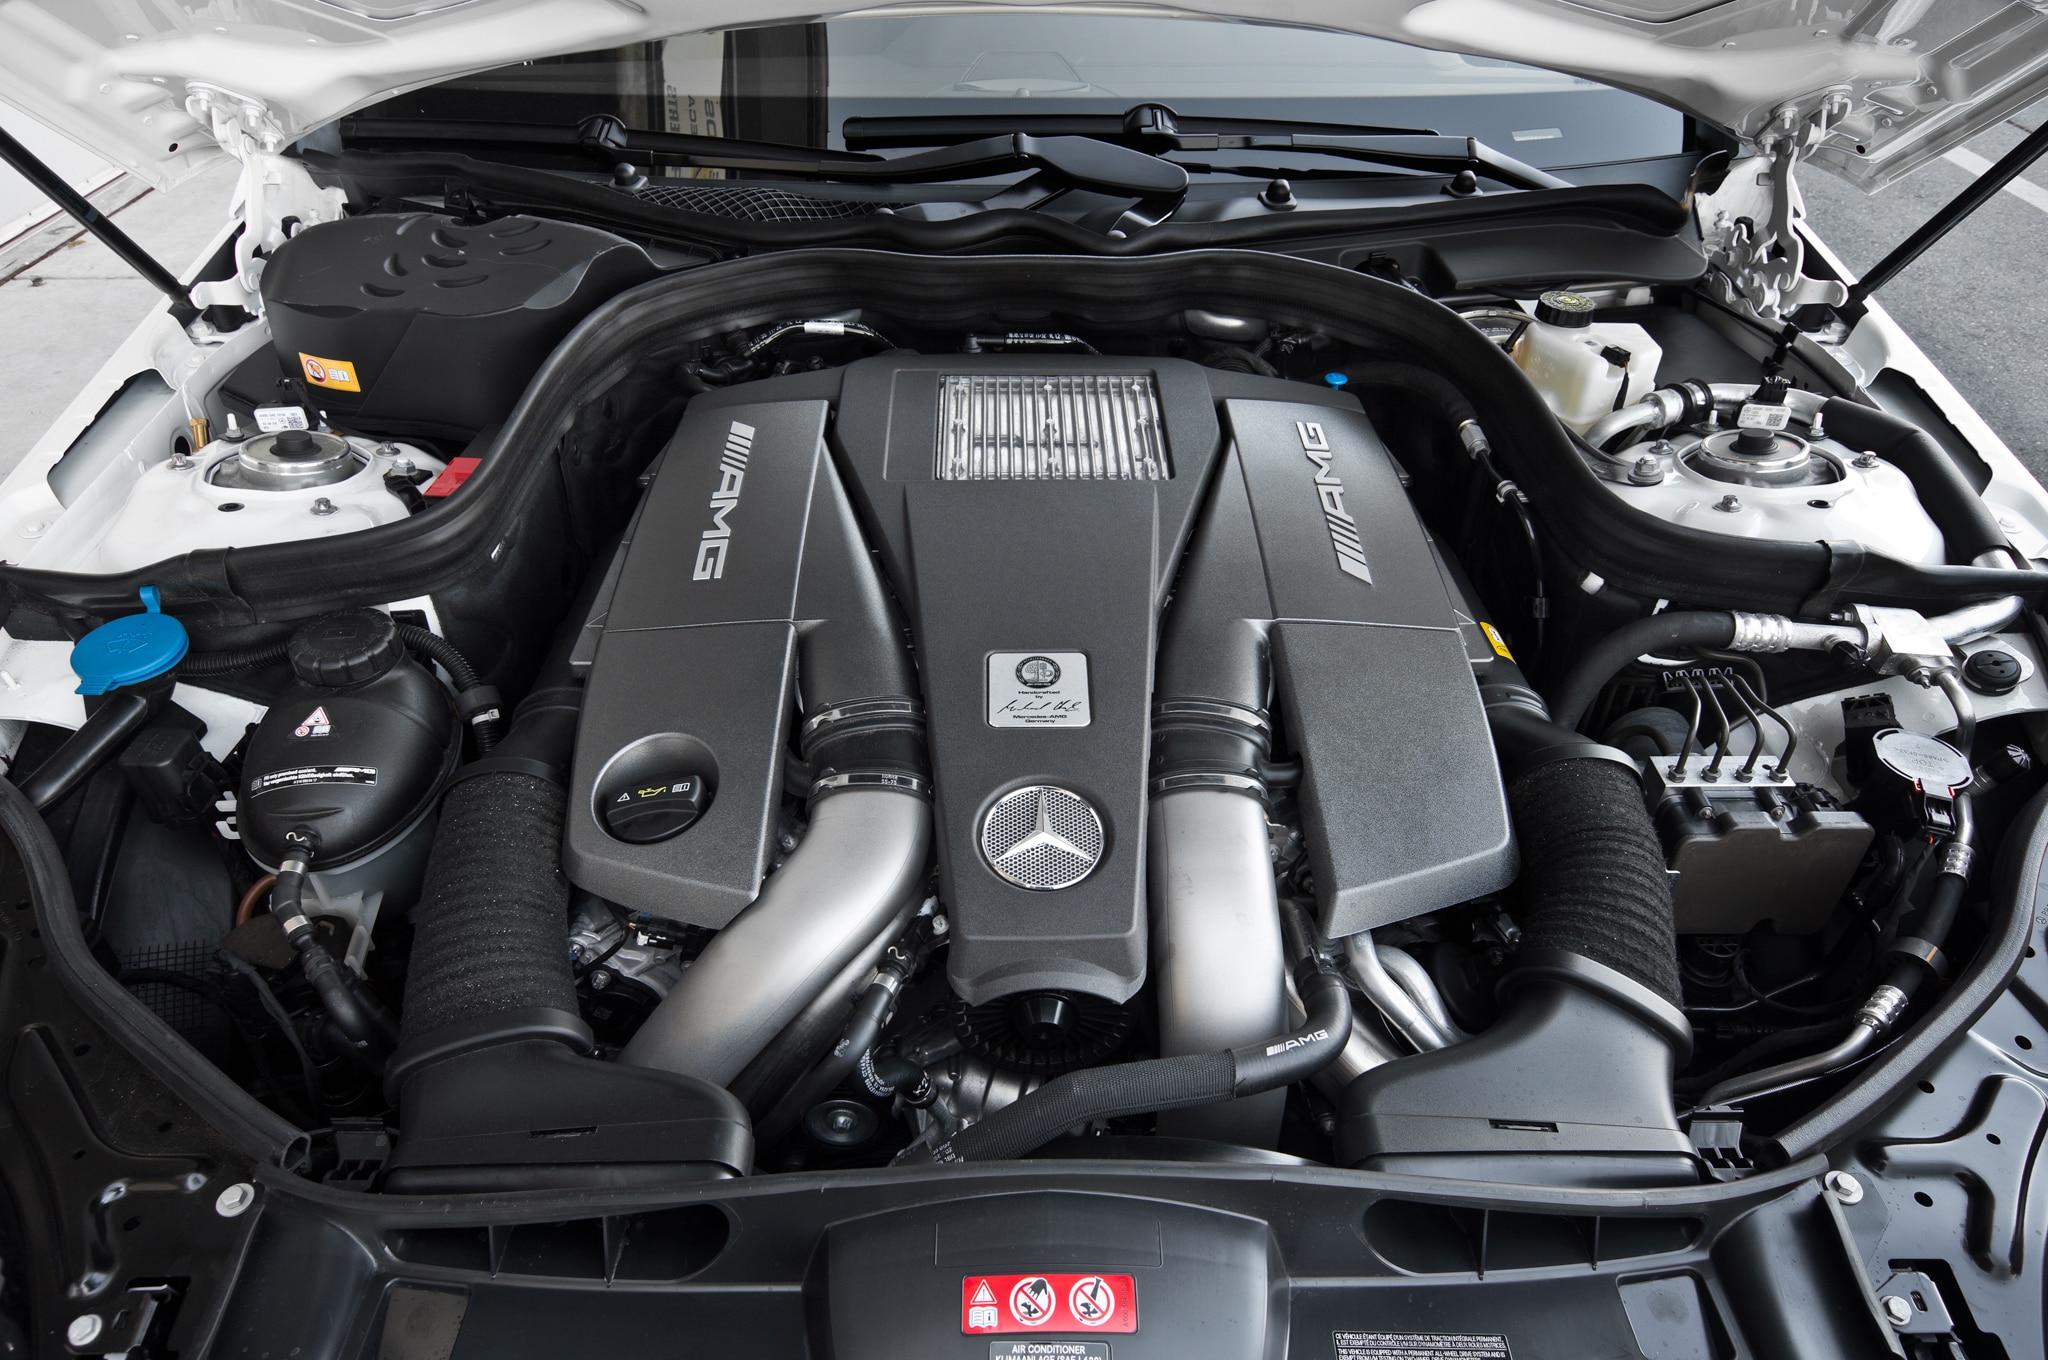 Mercedes Benz Motoröl : 2014 mercedes benz e63 amg s model 4matic wagon first test motor trend ~ Aude.kayakingforconservation.com Haus und Dekorationen